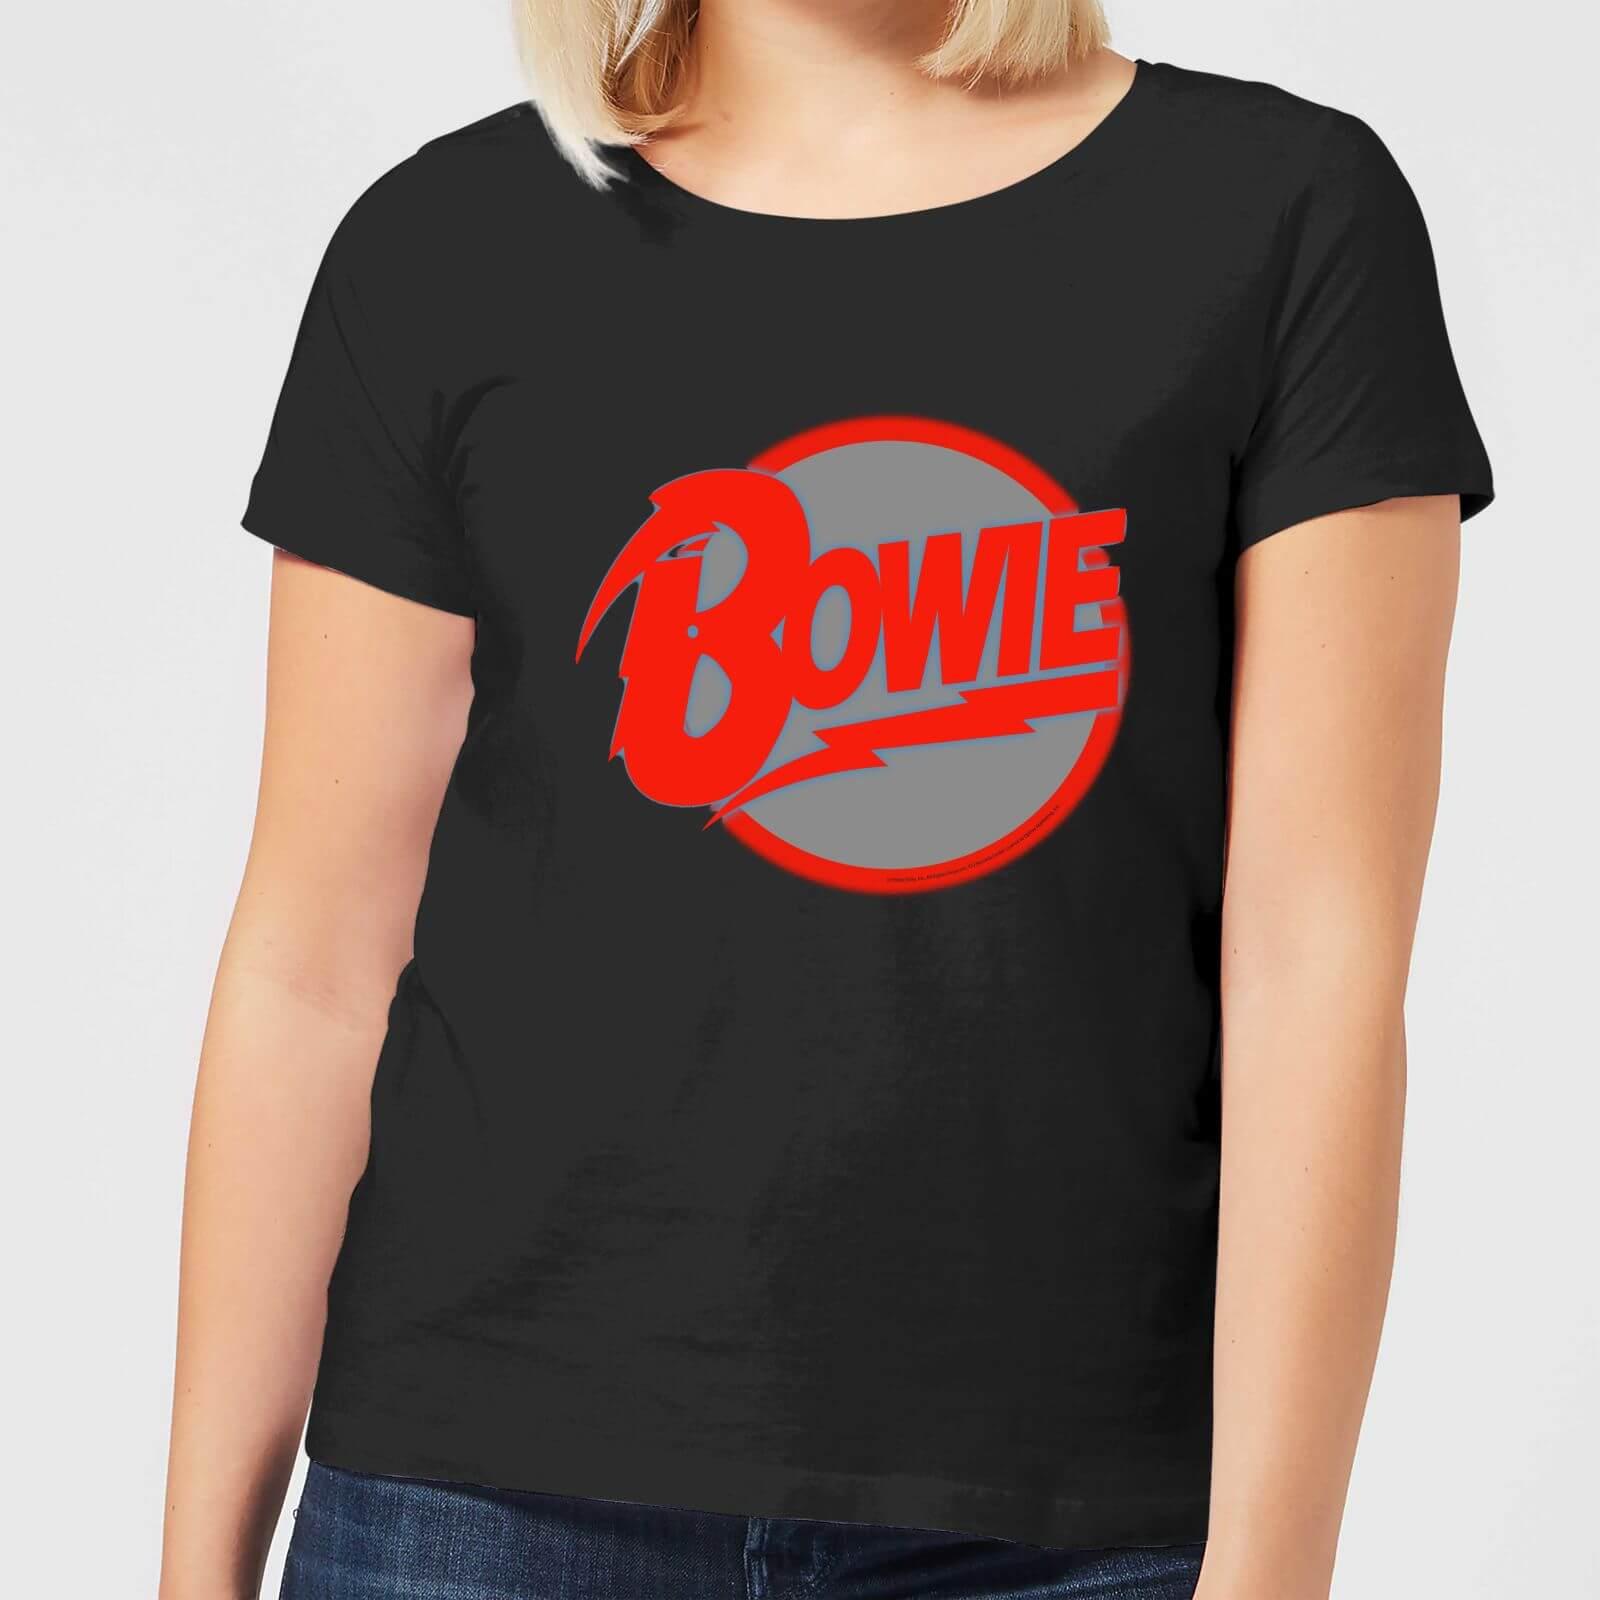 David Bowie Diamond Dogs Women's T-Shirt - Black - M - Black